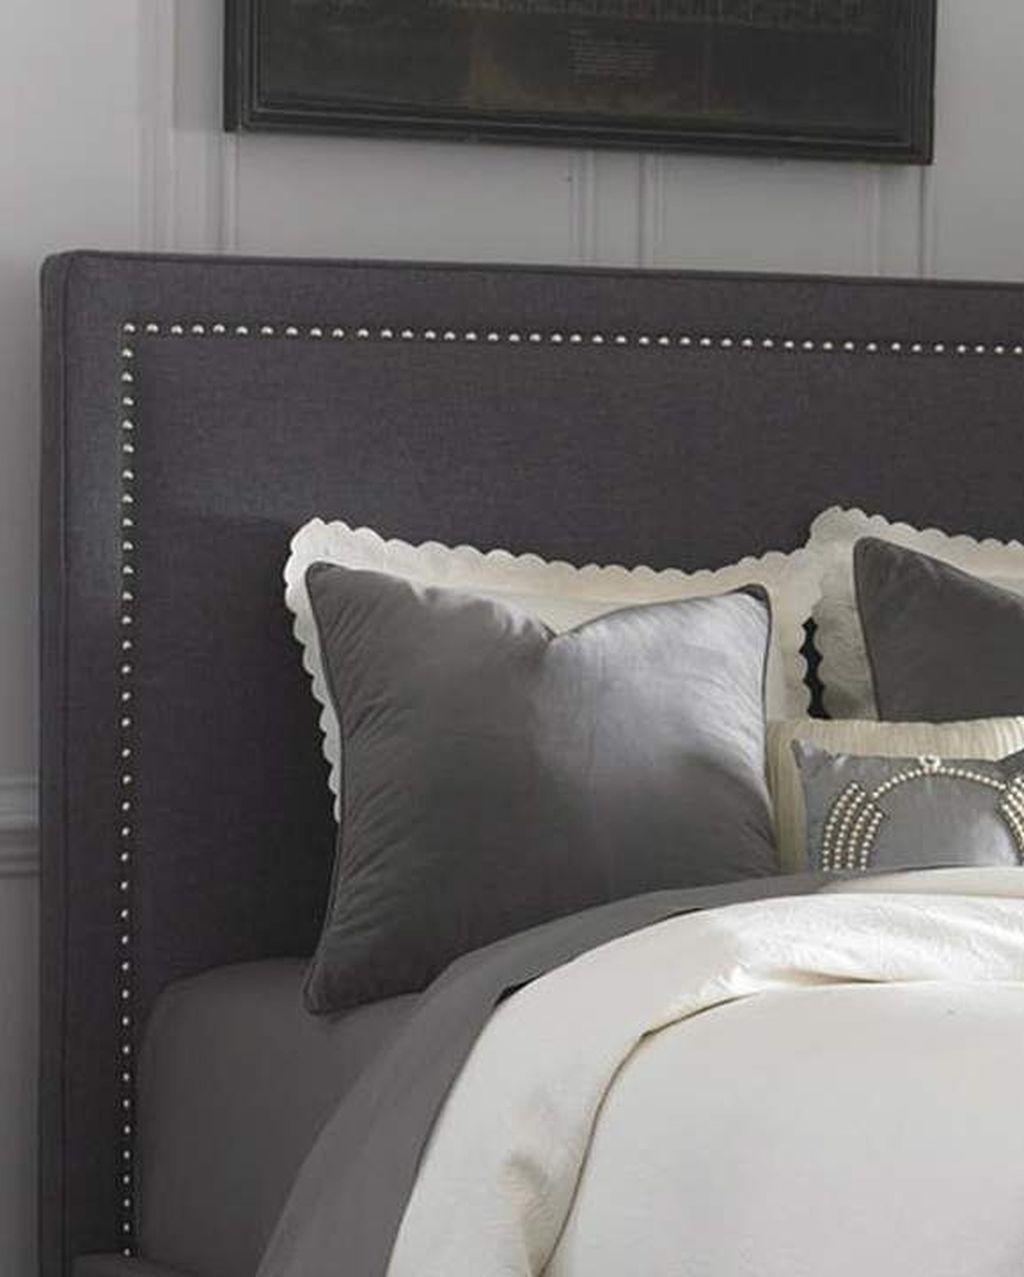 Stylish Diy Bedroom Headboard Design Ideas That Will Inspire You 27